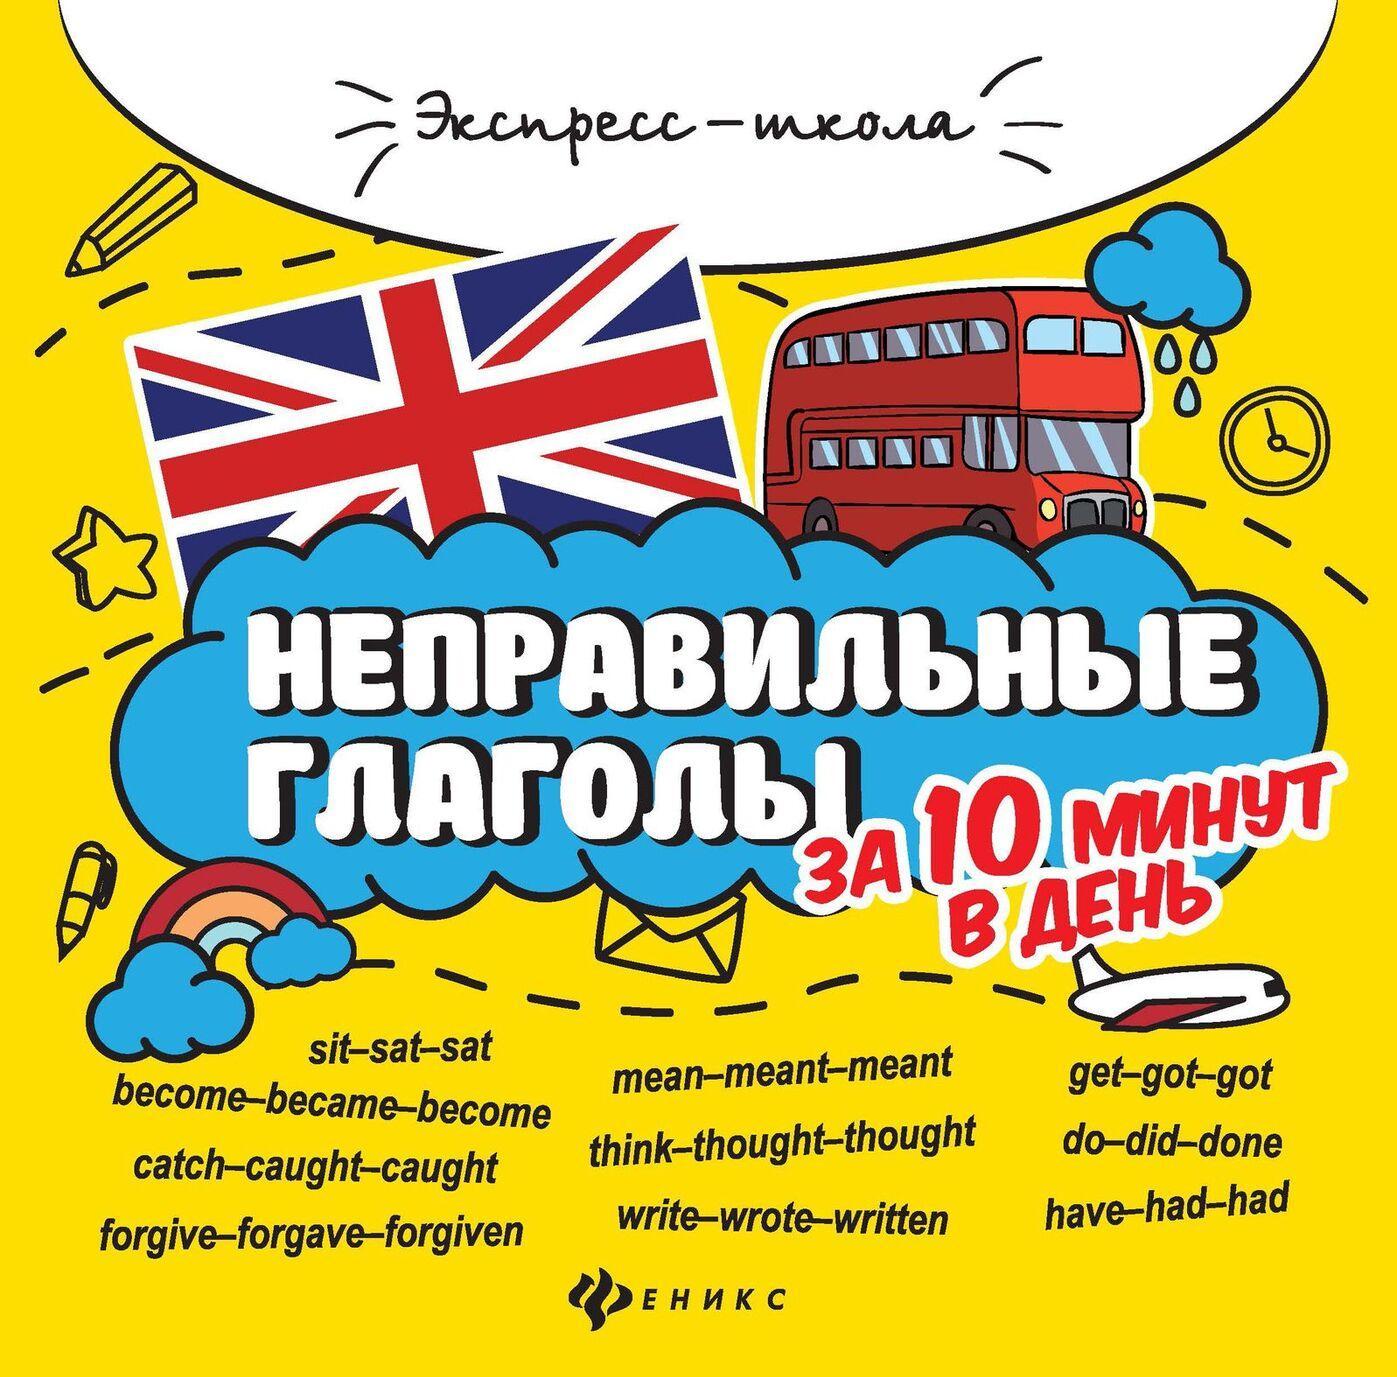 Nepravilnye glagoly za 10 minut v den | Bakhurova Evgenija Petrovna